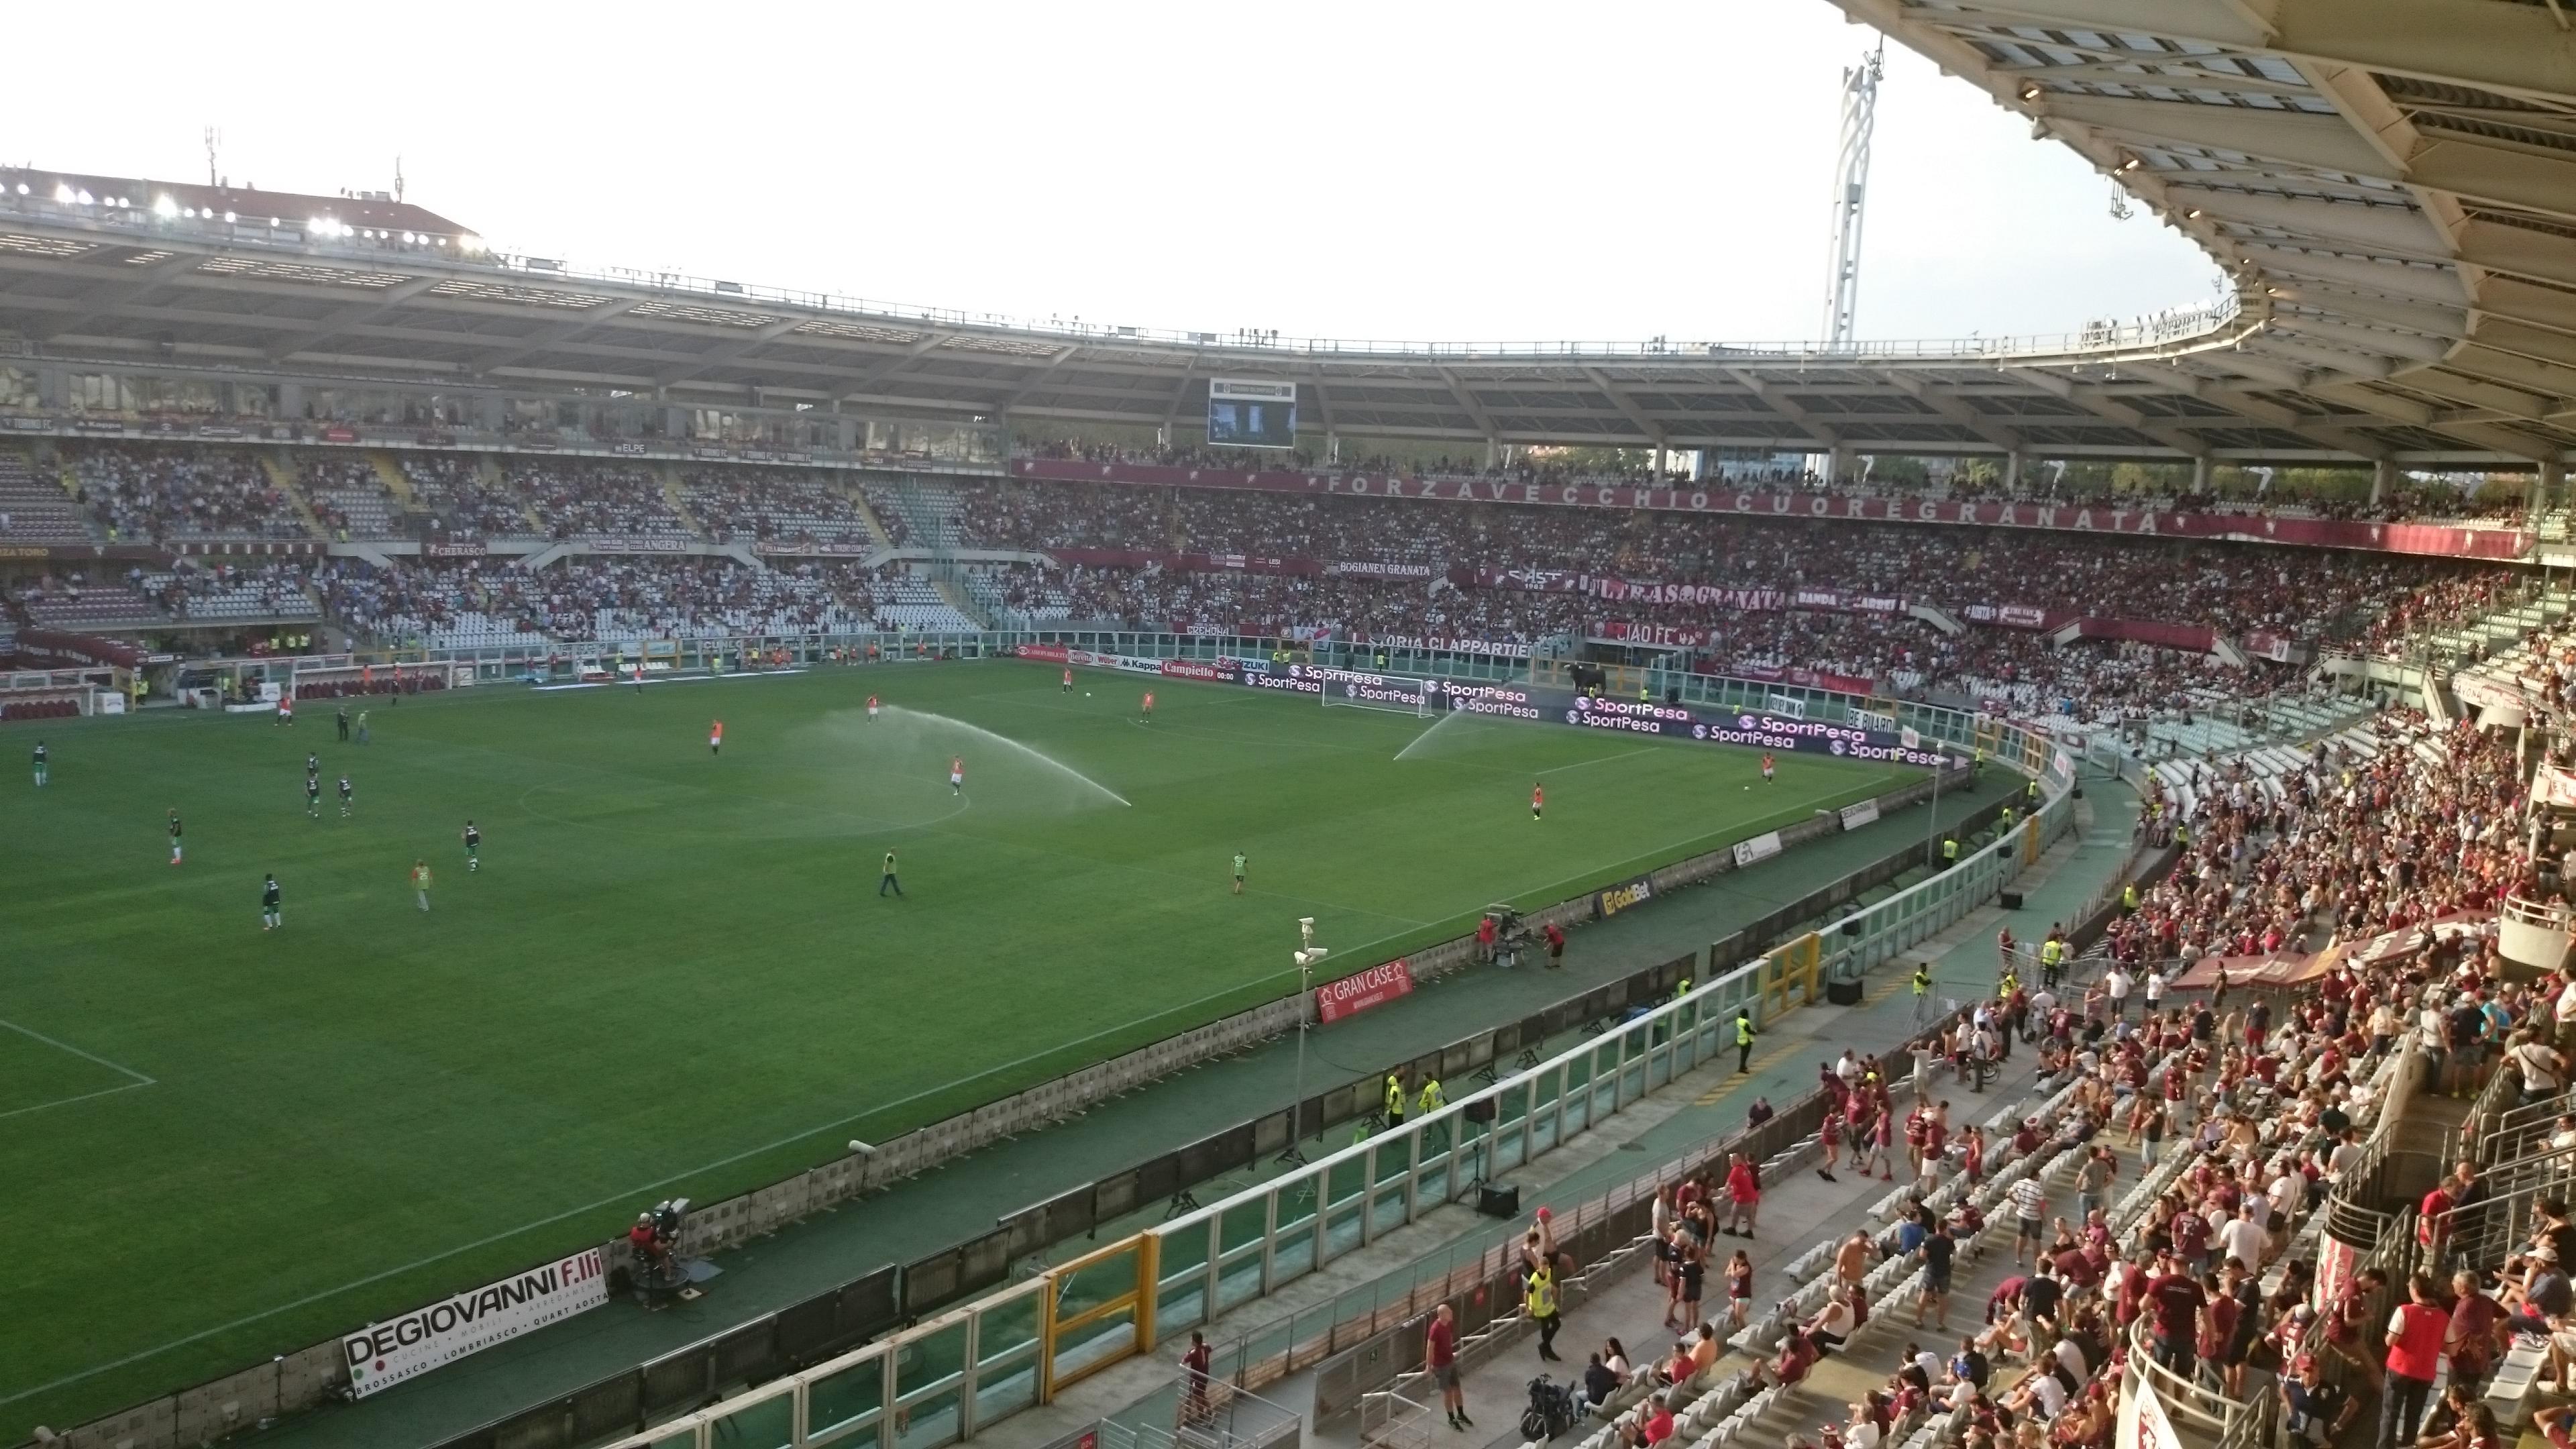 Stadio Olimpico Grande Torino Wikipedia